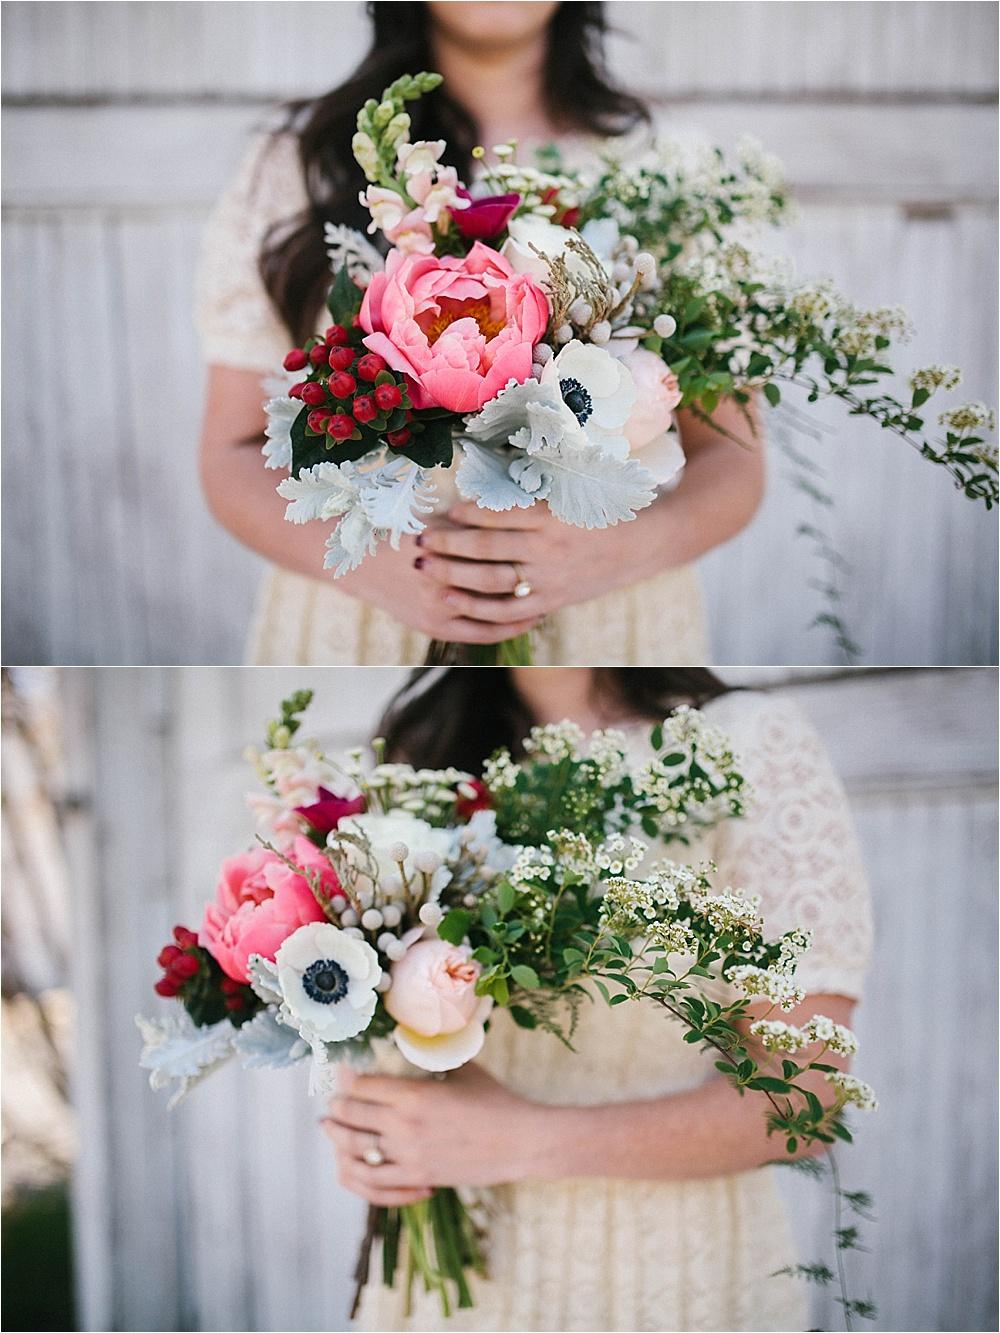 manzanita photo by rebecca caridad wedding lifestlye photography floral design calligraphy_1254.jpg